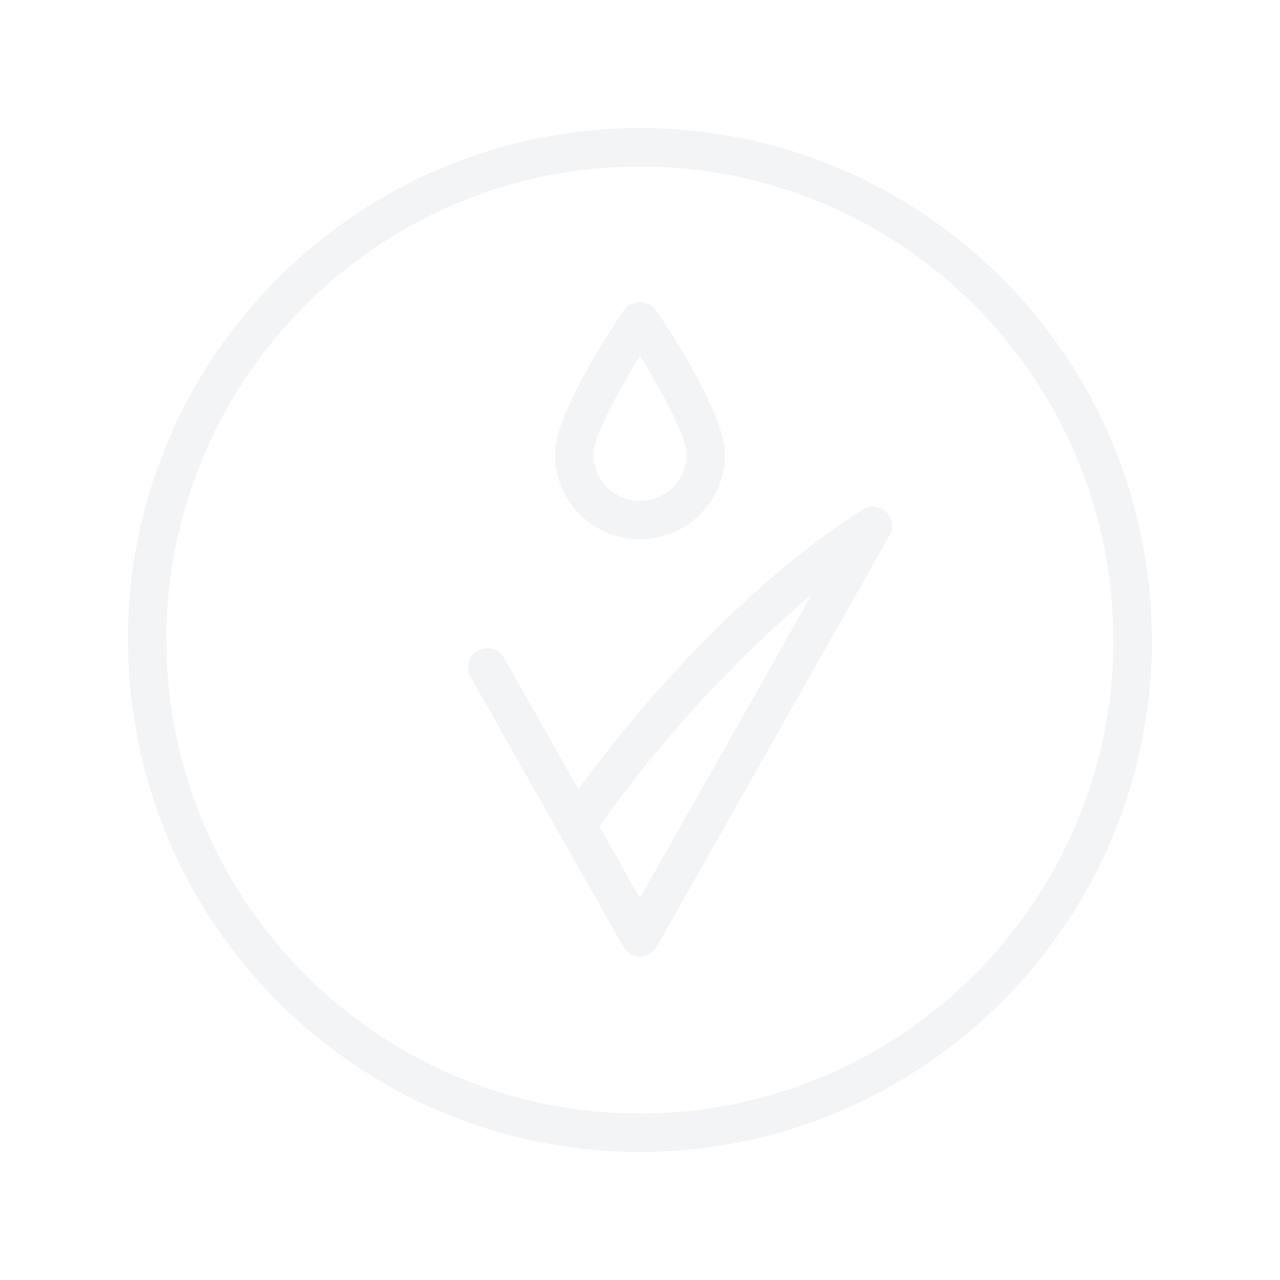 CARITA Ideal Hydration Lagoon Bath Mask 50ml